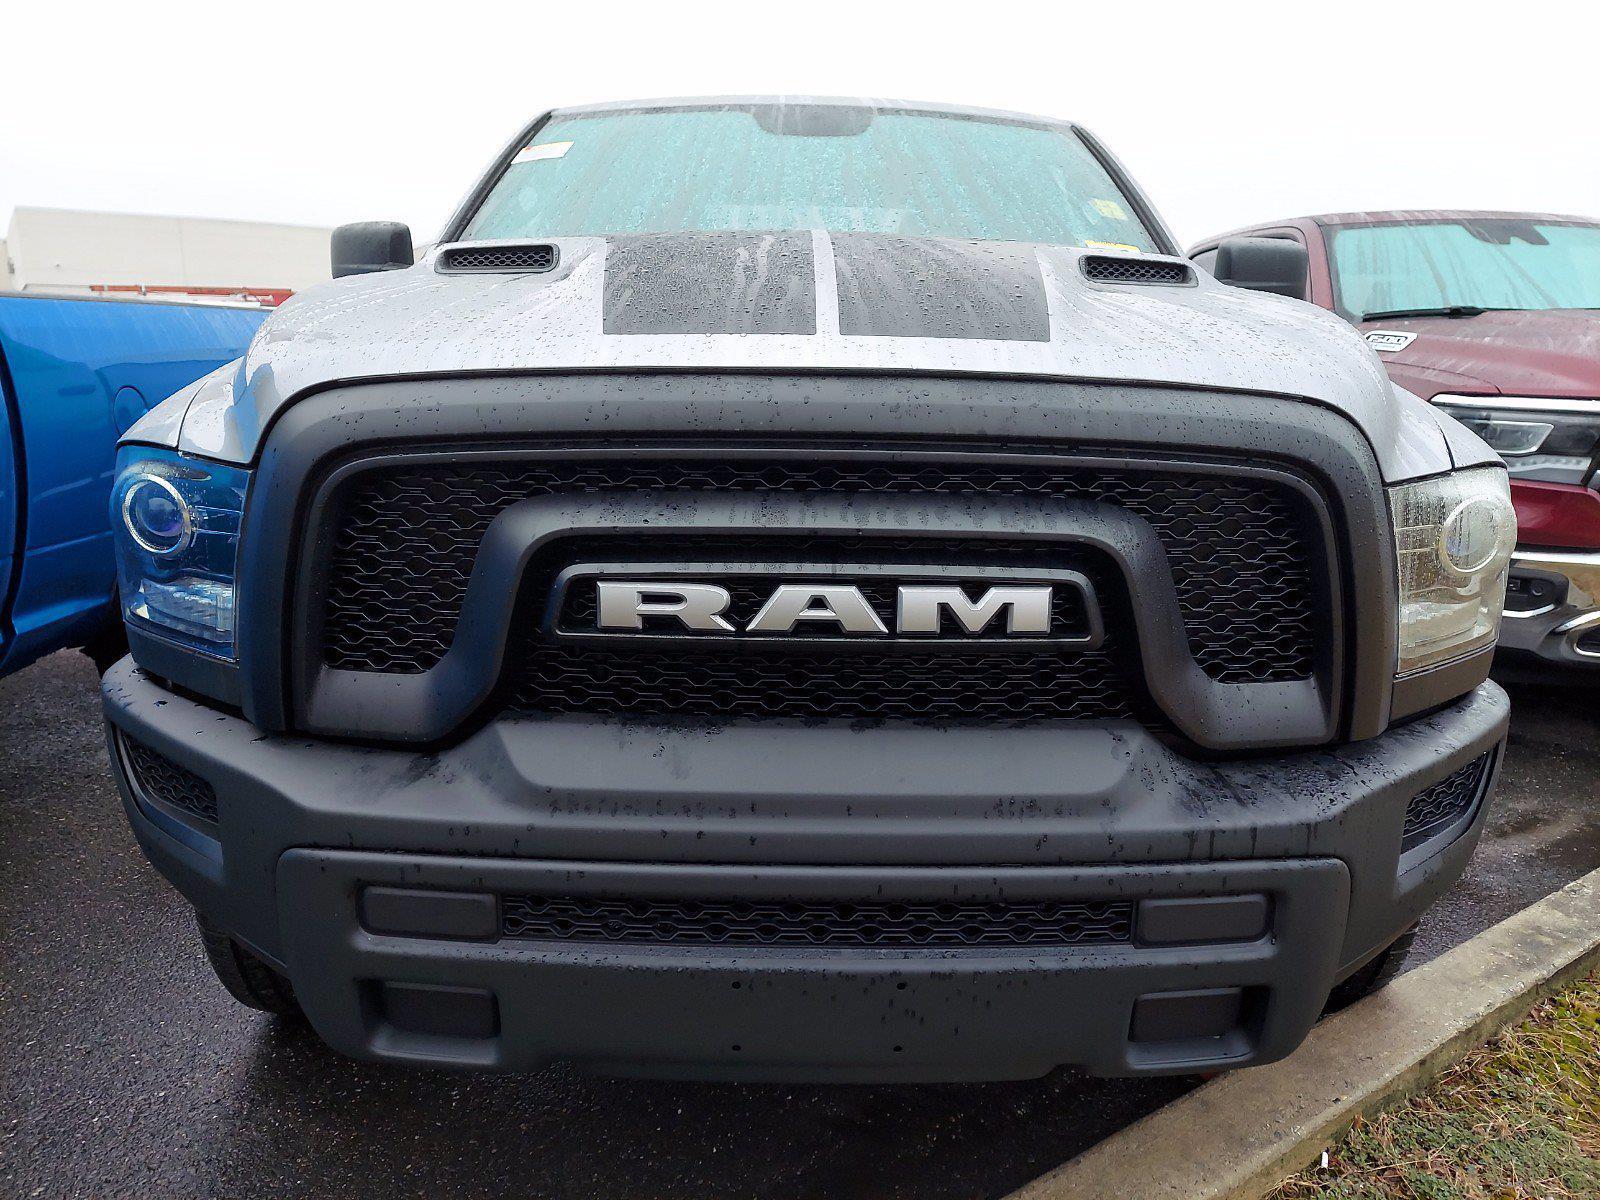 2021 Ram 1500 Quad Cab 4x4, Pickup #CM171 - photo 1